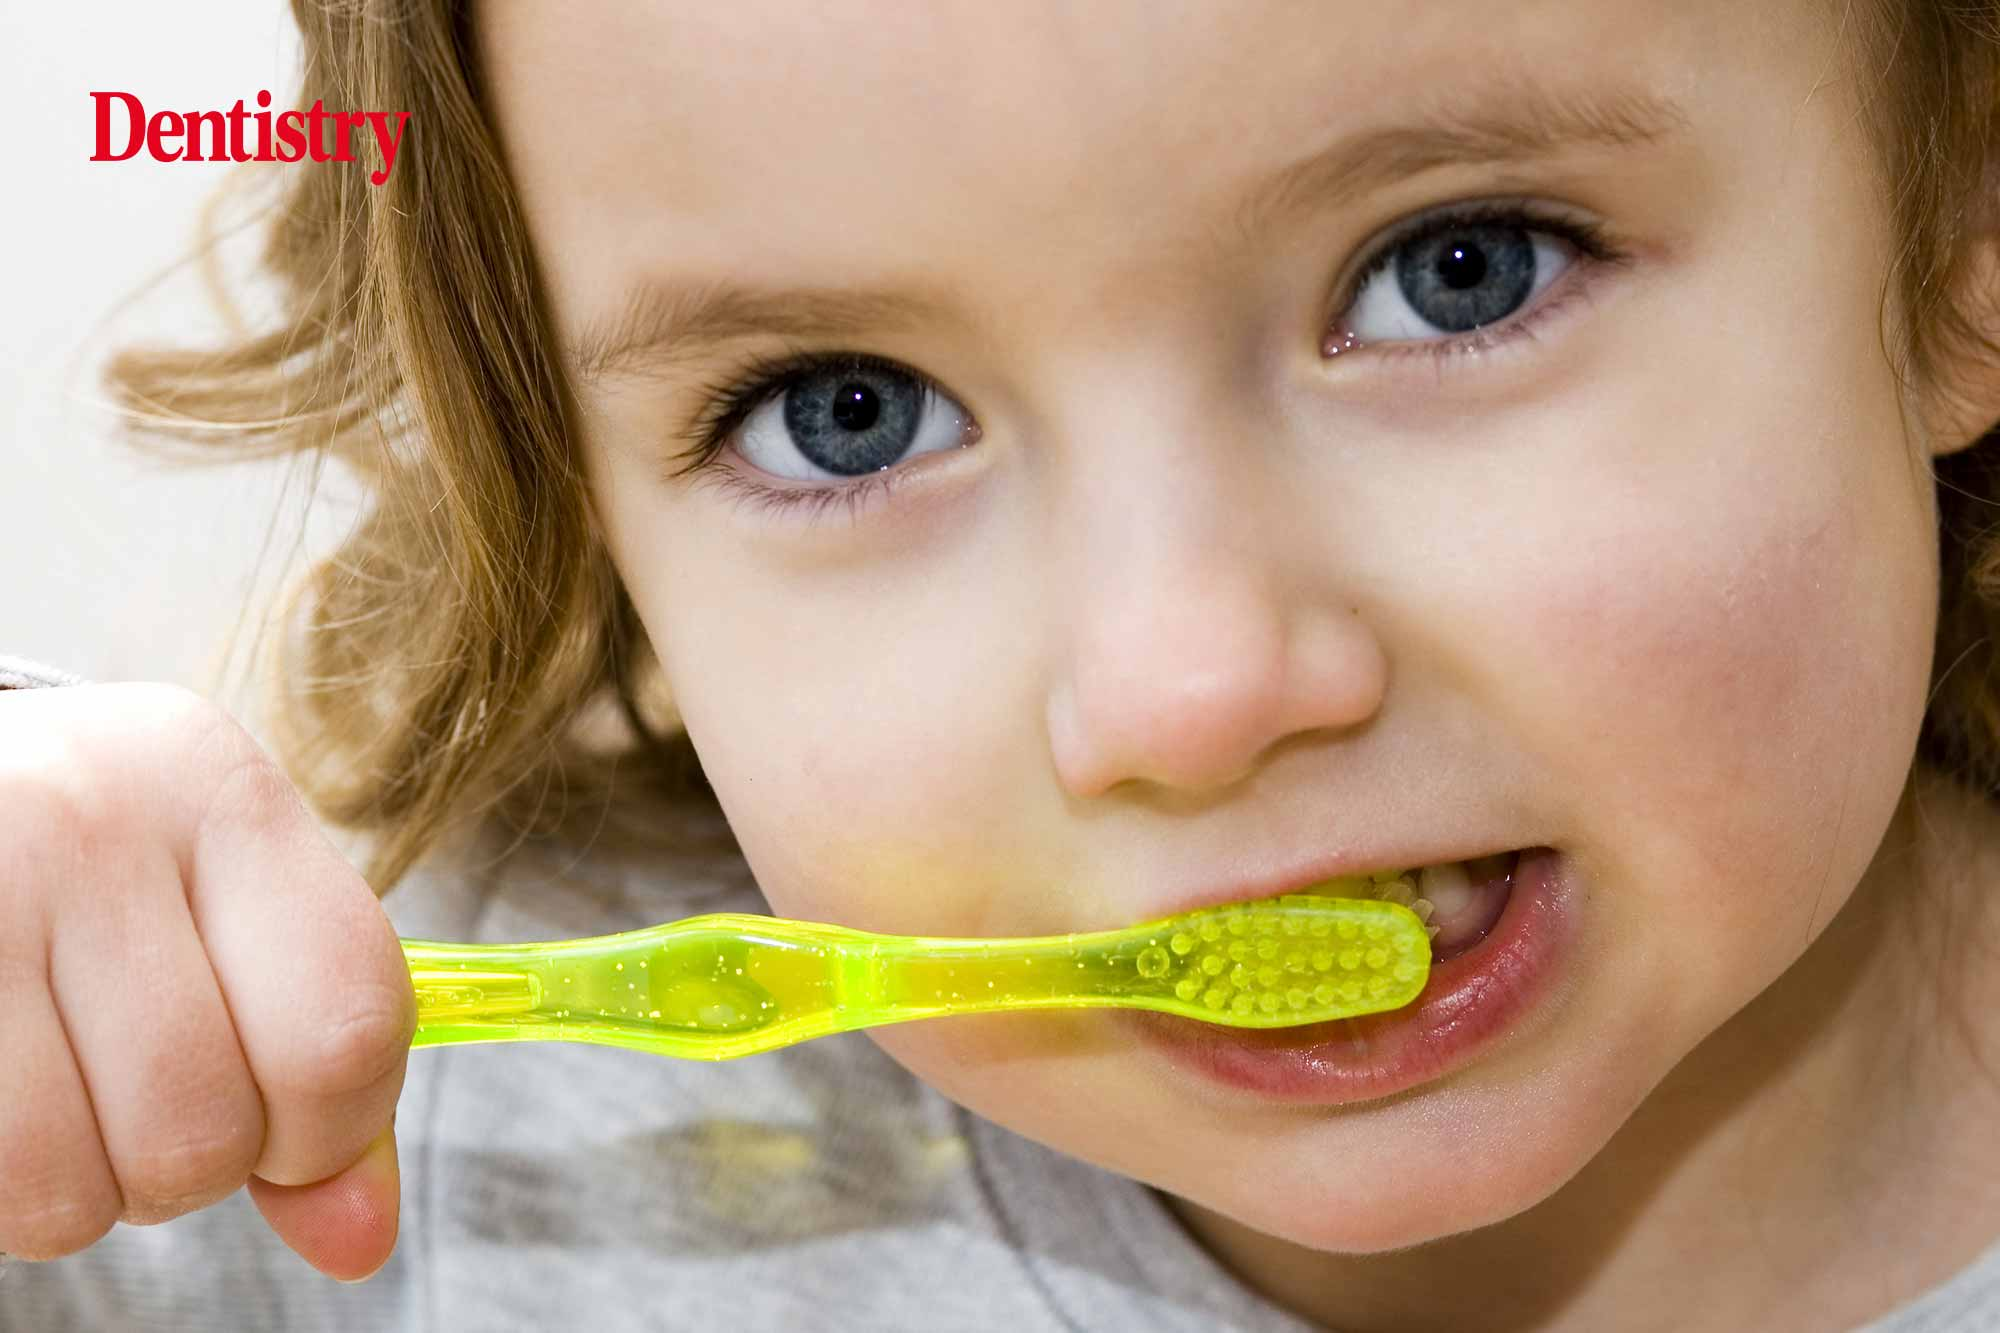 Mothers' mental health impacts children's oral hygiene